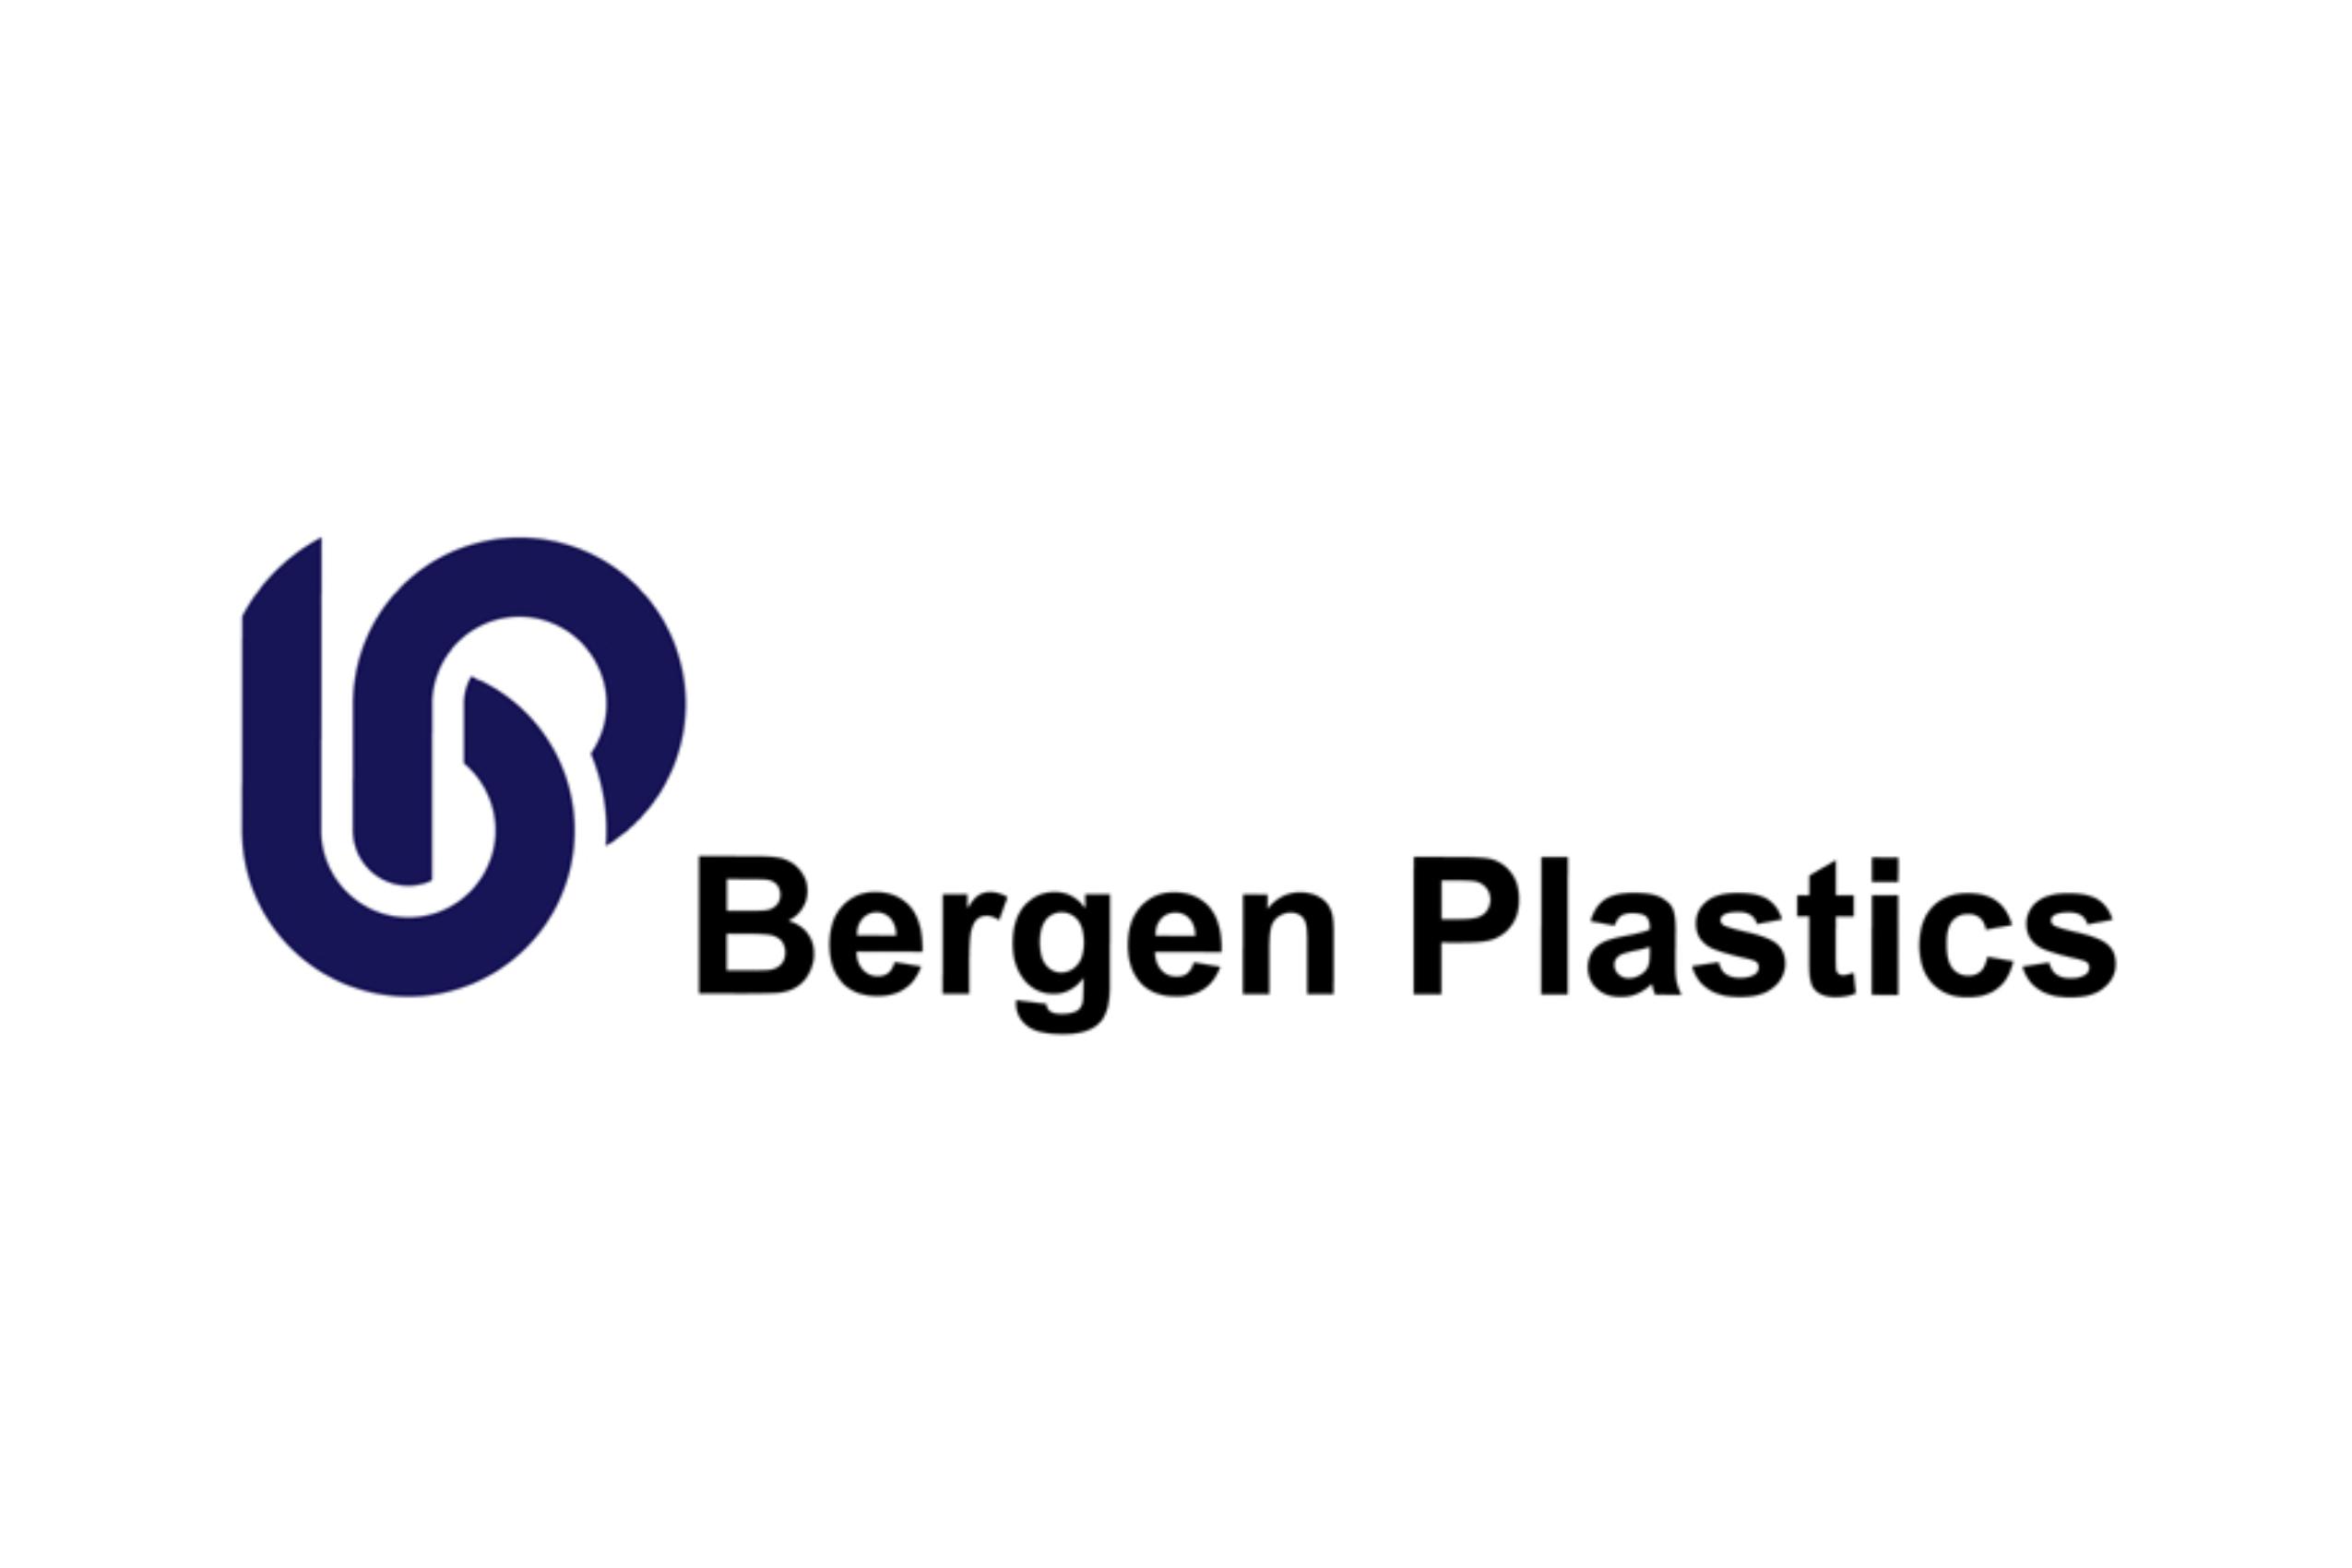 https://europeanplasticspact.org/wp-content/uploads/2021/05/bergen-plastics-2.png